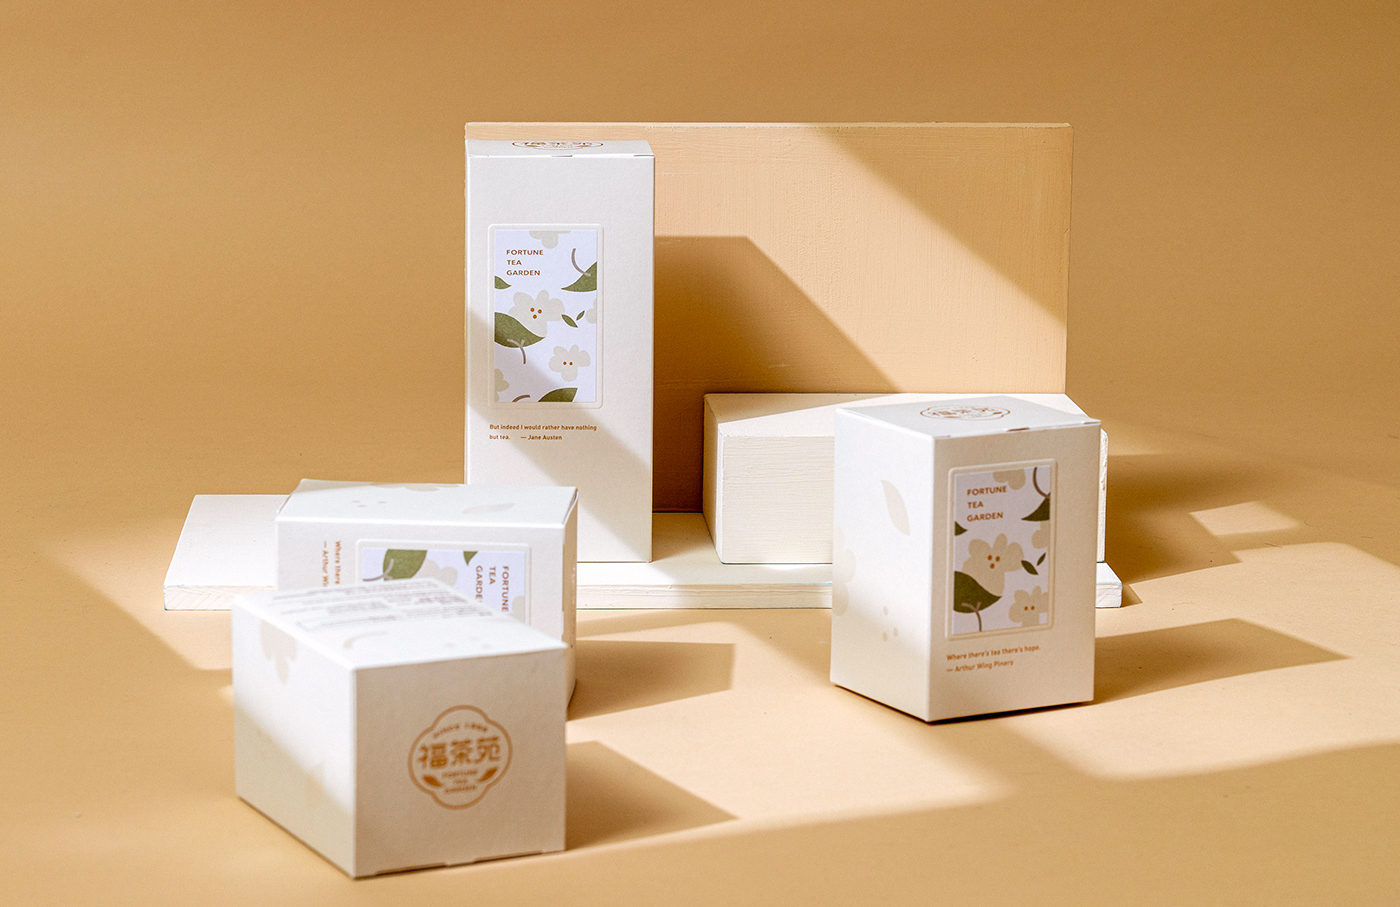 Image may contain: box, carton and indoor